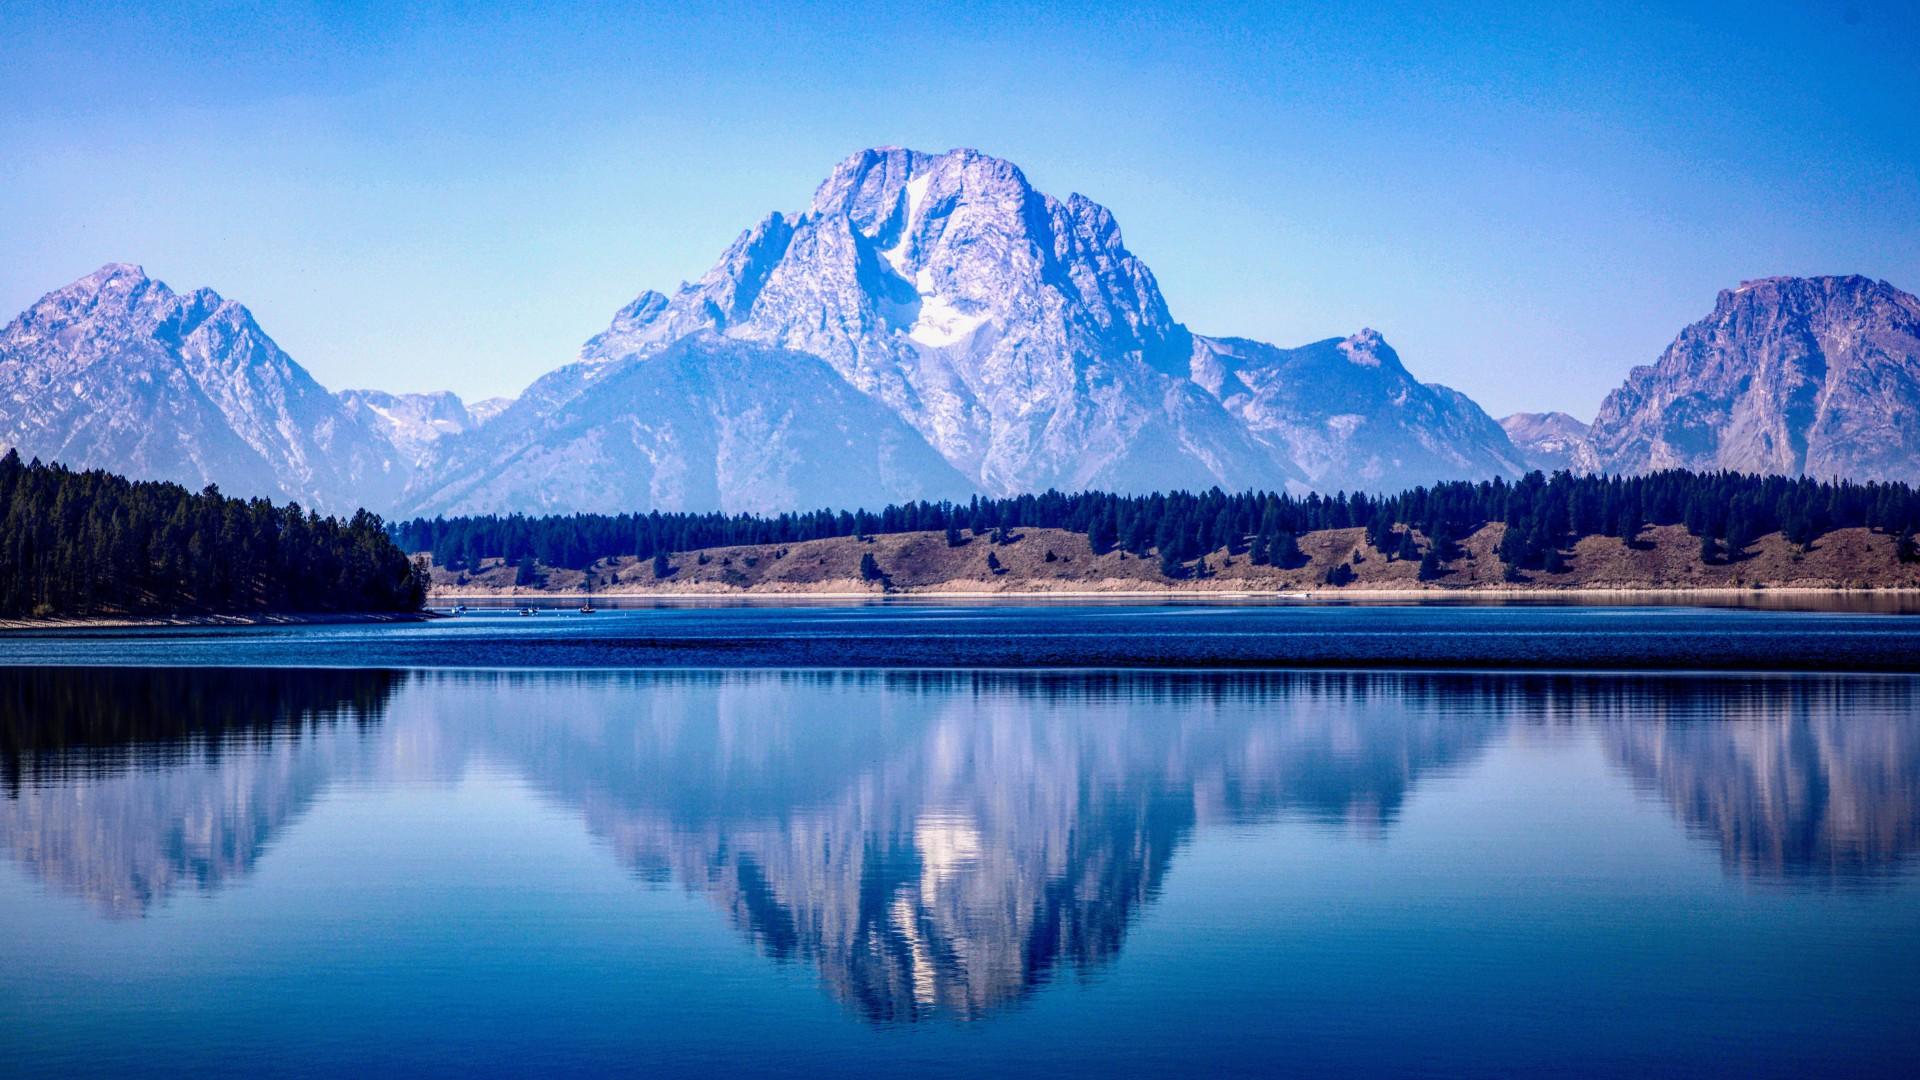 Iphone 5s Wallpaper 3d Blue Mountains Landscape 4k 8k Wallpapers Hd Wallpapers